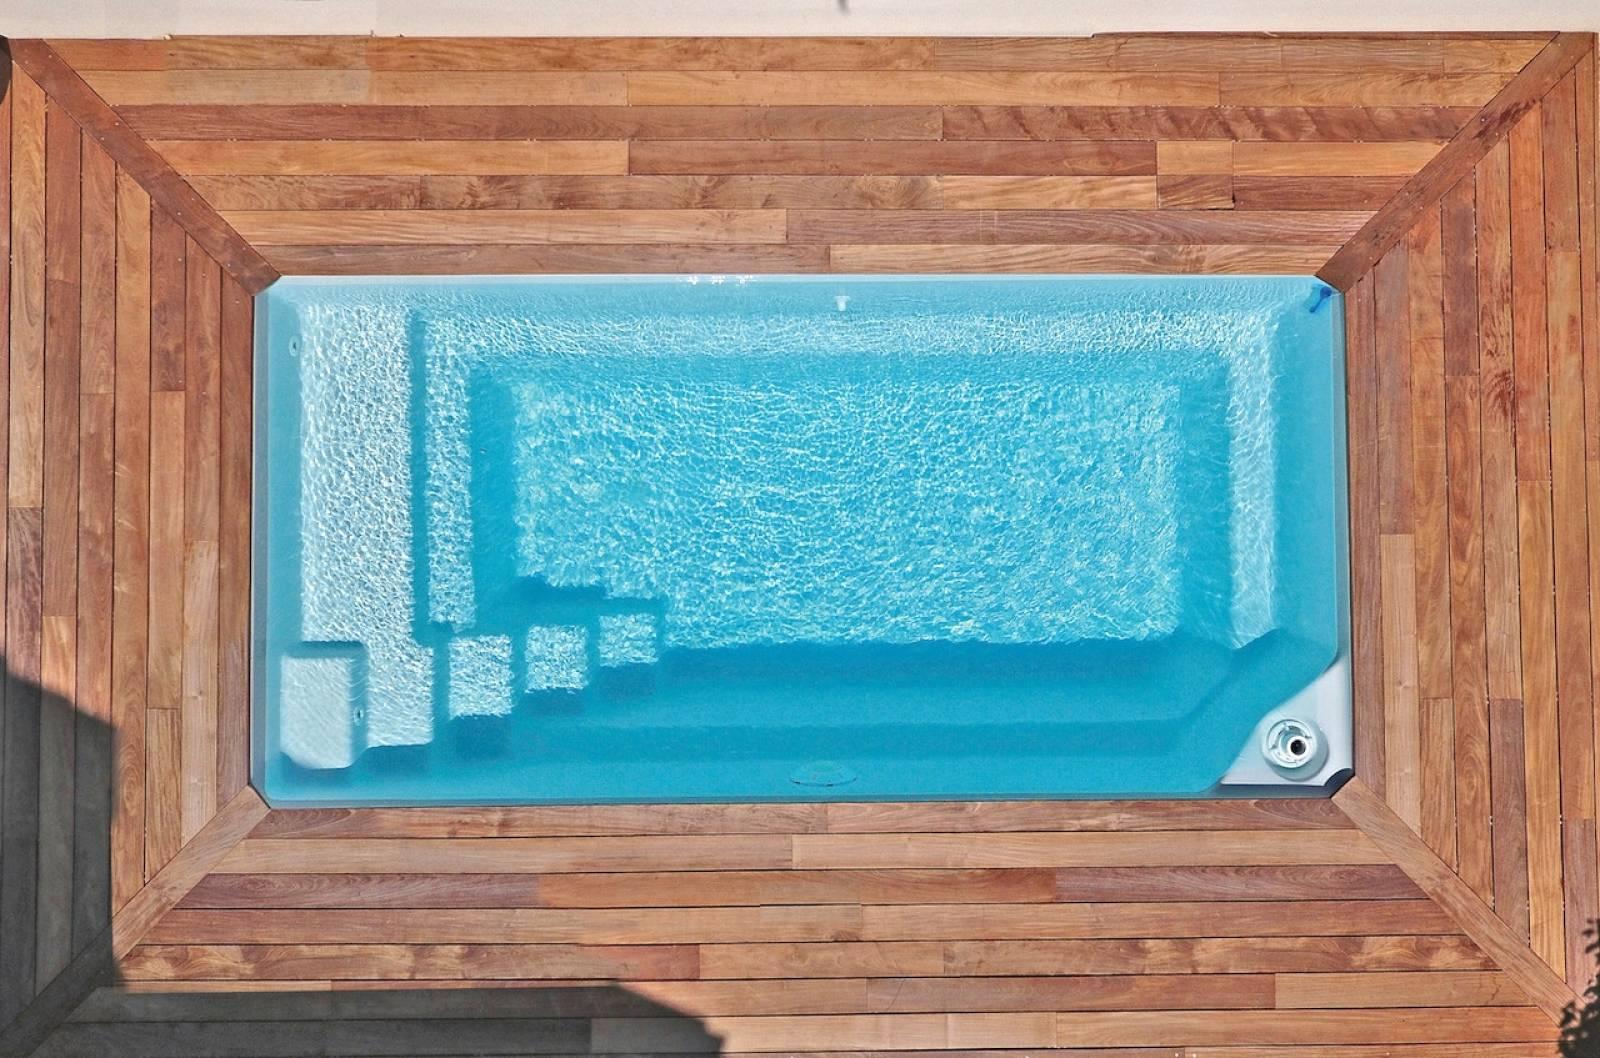 Robot Piscine Plan De Campagne piscine coque polyester modèle starlite - alliances piscines